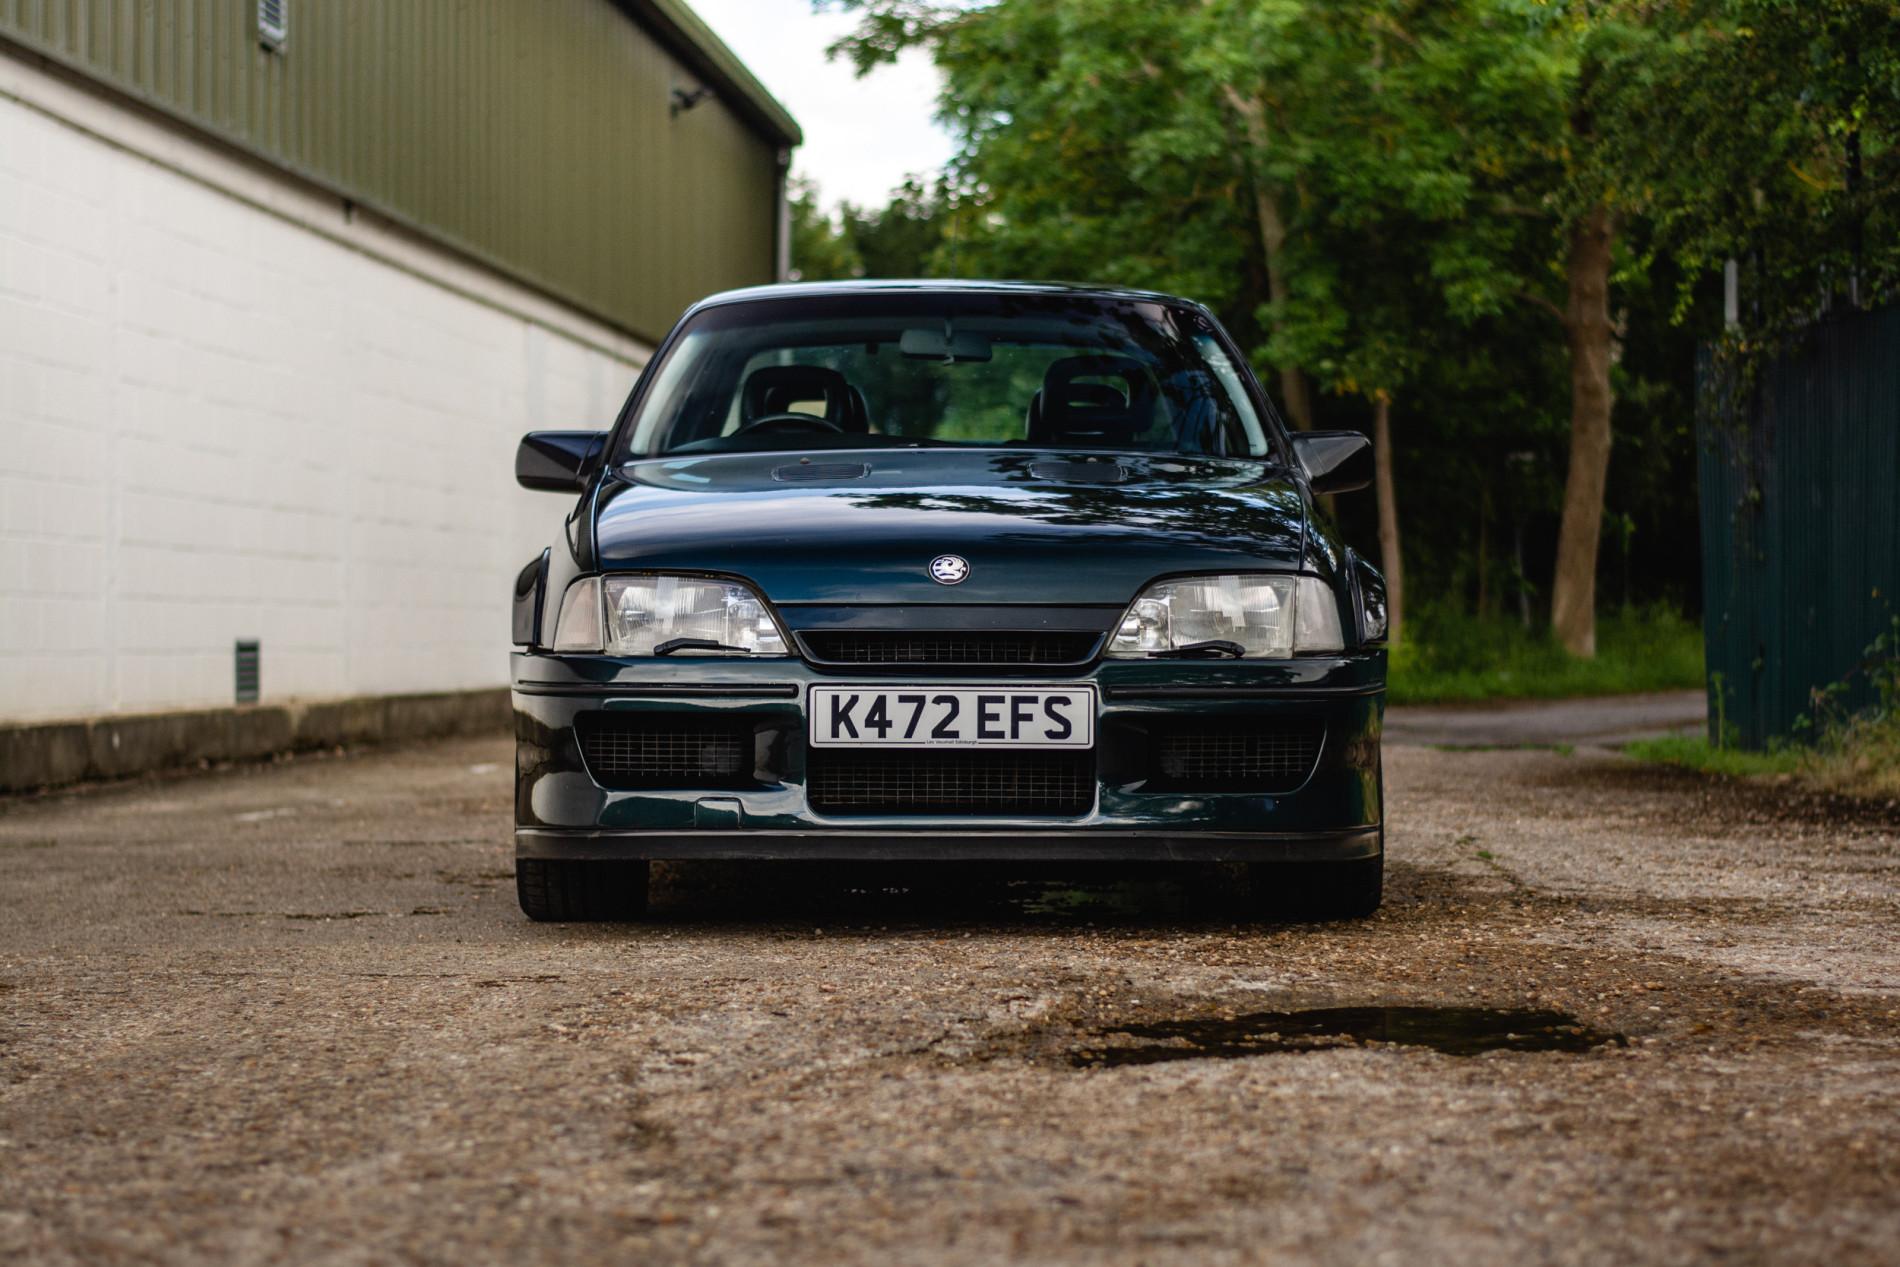 Vauxhall Lotus Carlton de vanzare - Vauxhall Lotus Carlton de vanzare